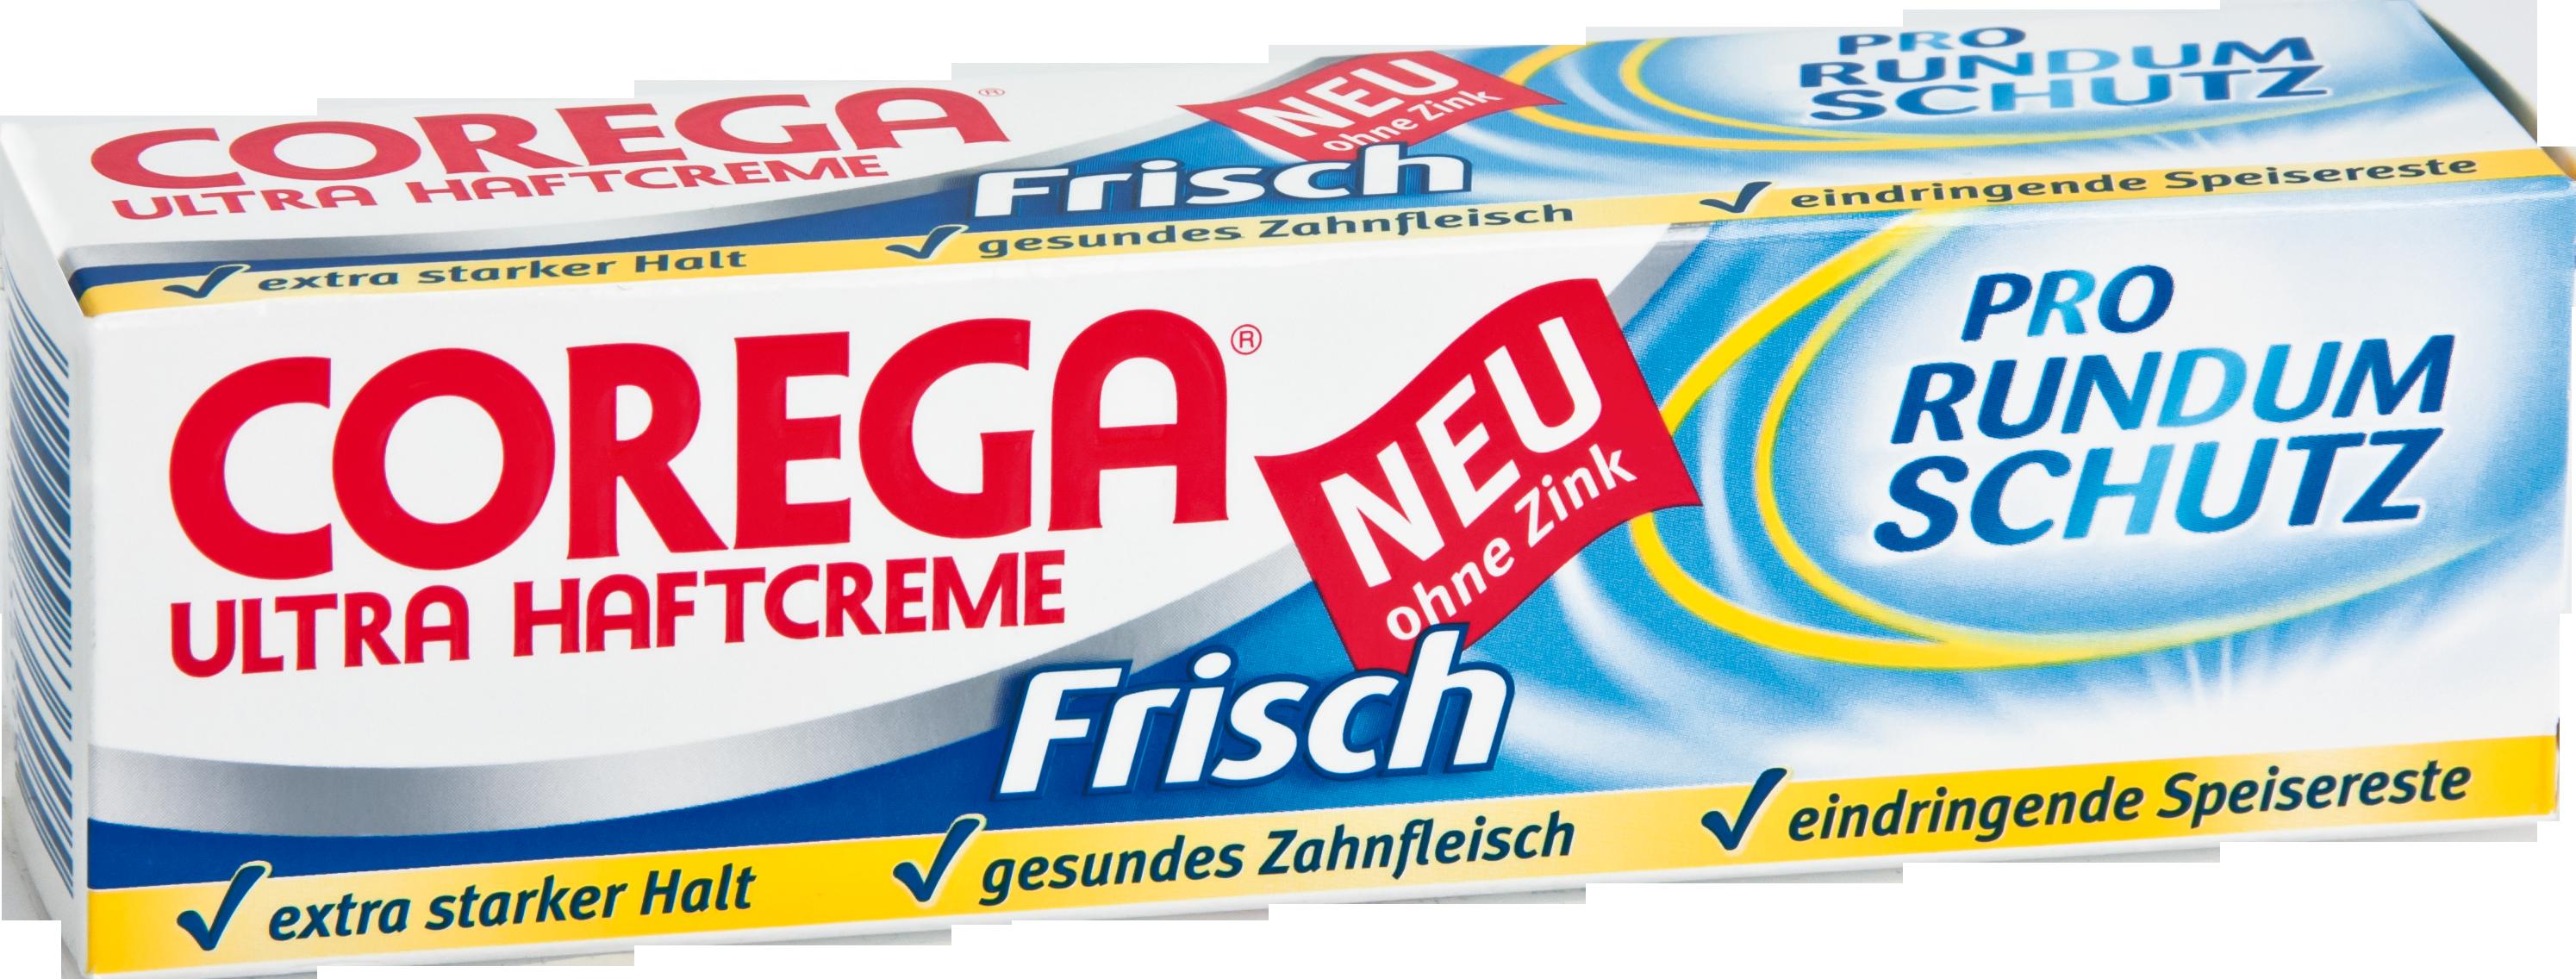 COREGA Ultra Haftcreme Frisch